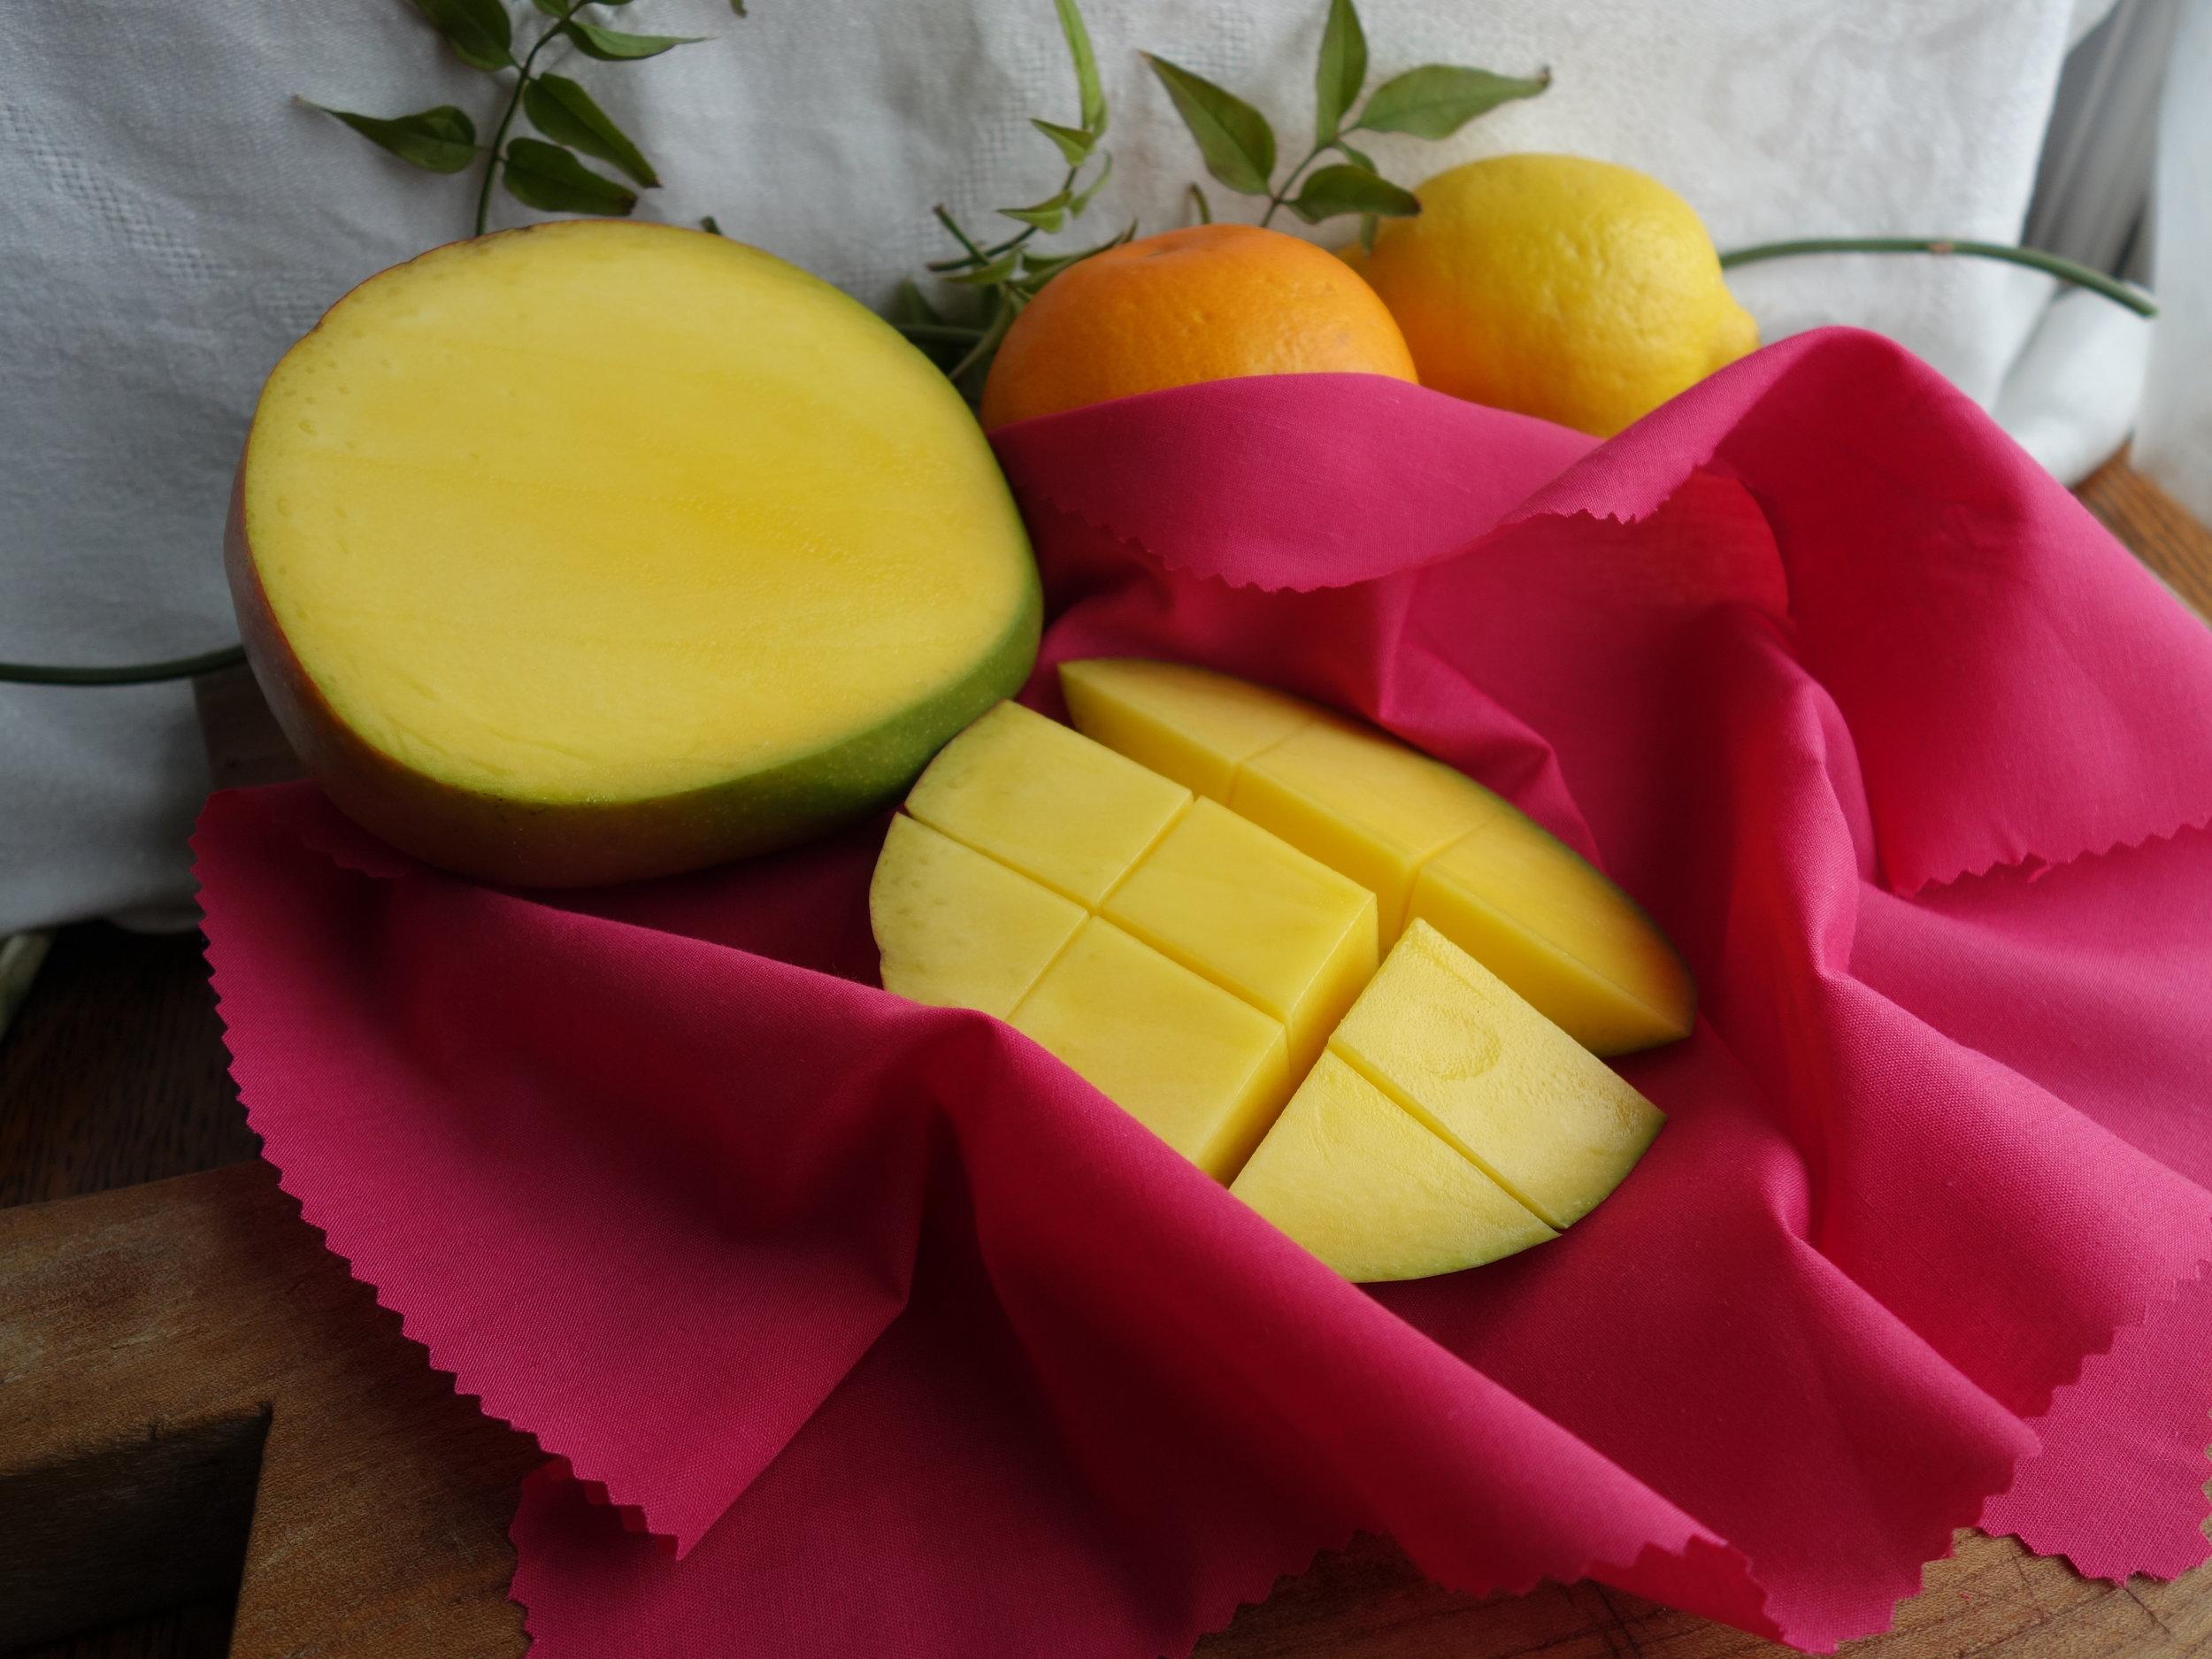 Sliced fresh mango